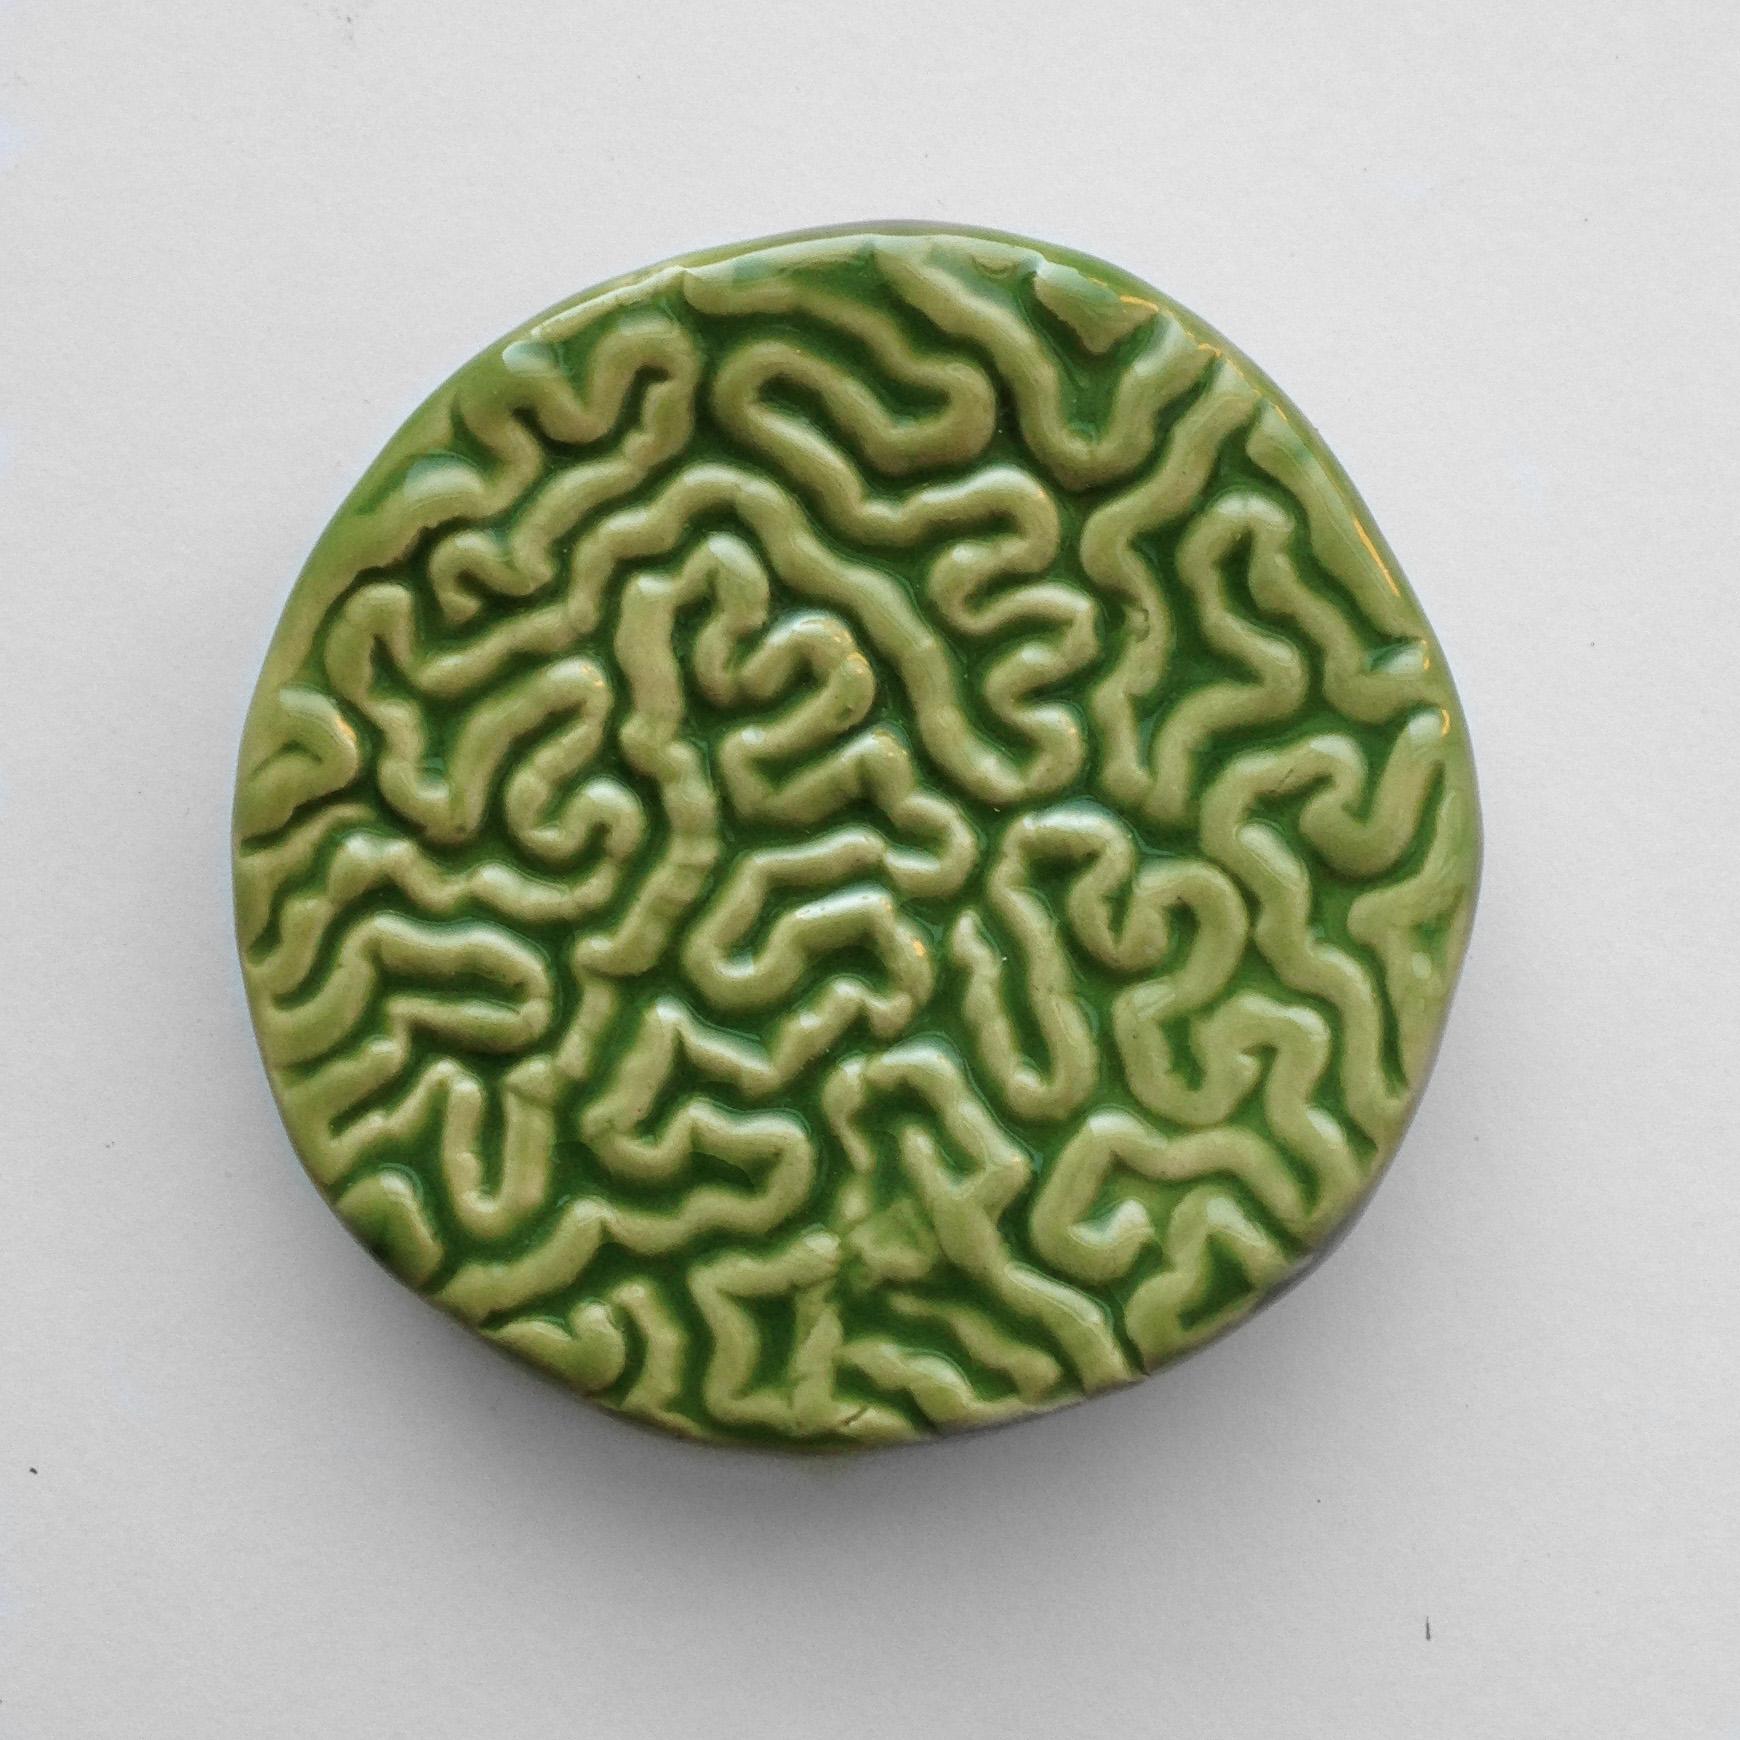 Guts soap dish, green